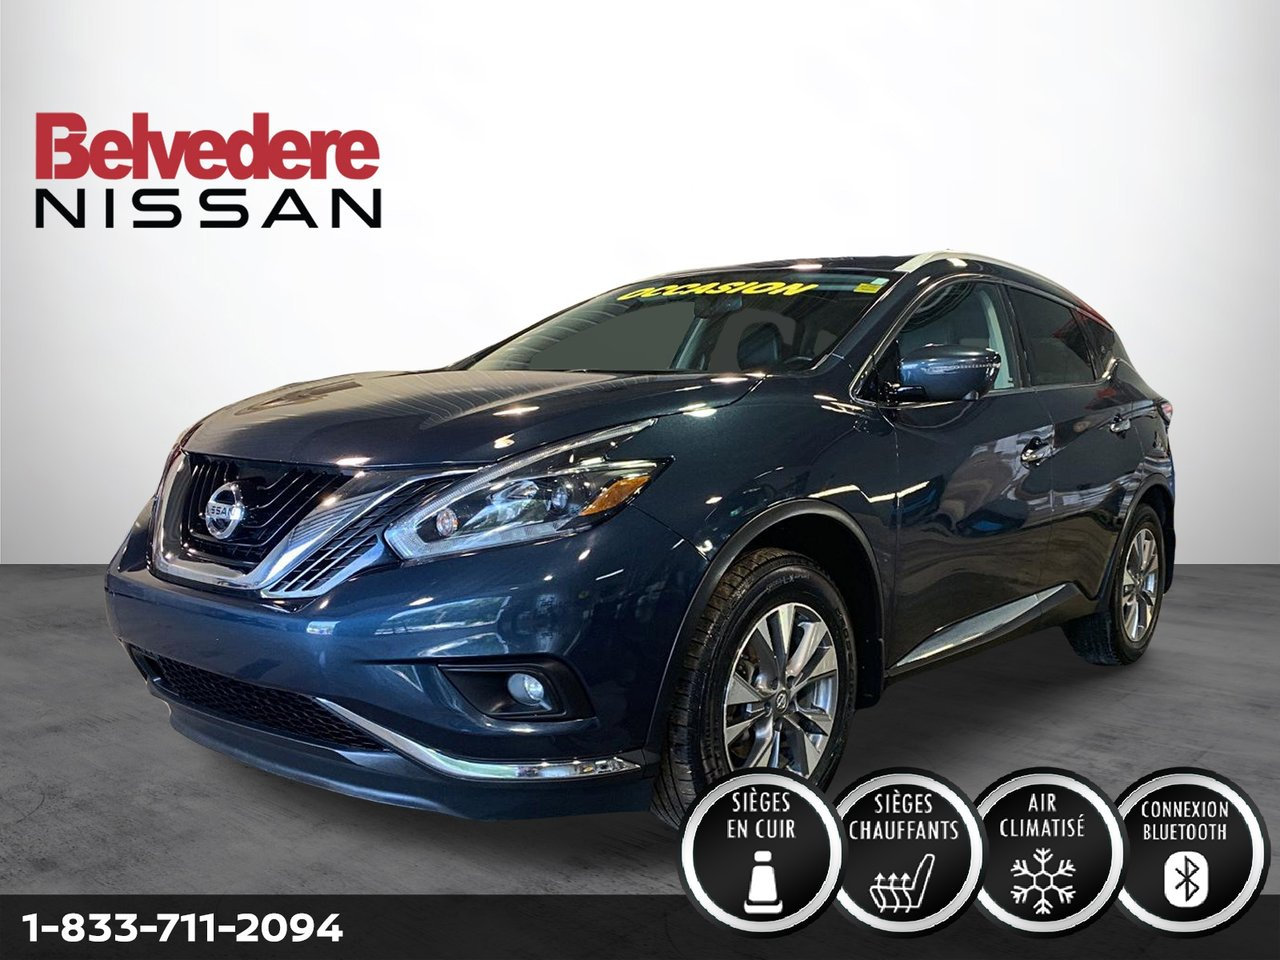 Nissan Murano 2018 SL AWD CUIR TOIT-OUVRANT NAVIGATION CAMERA MA